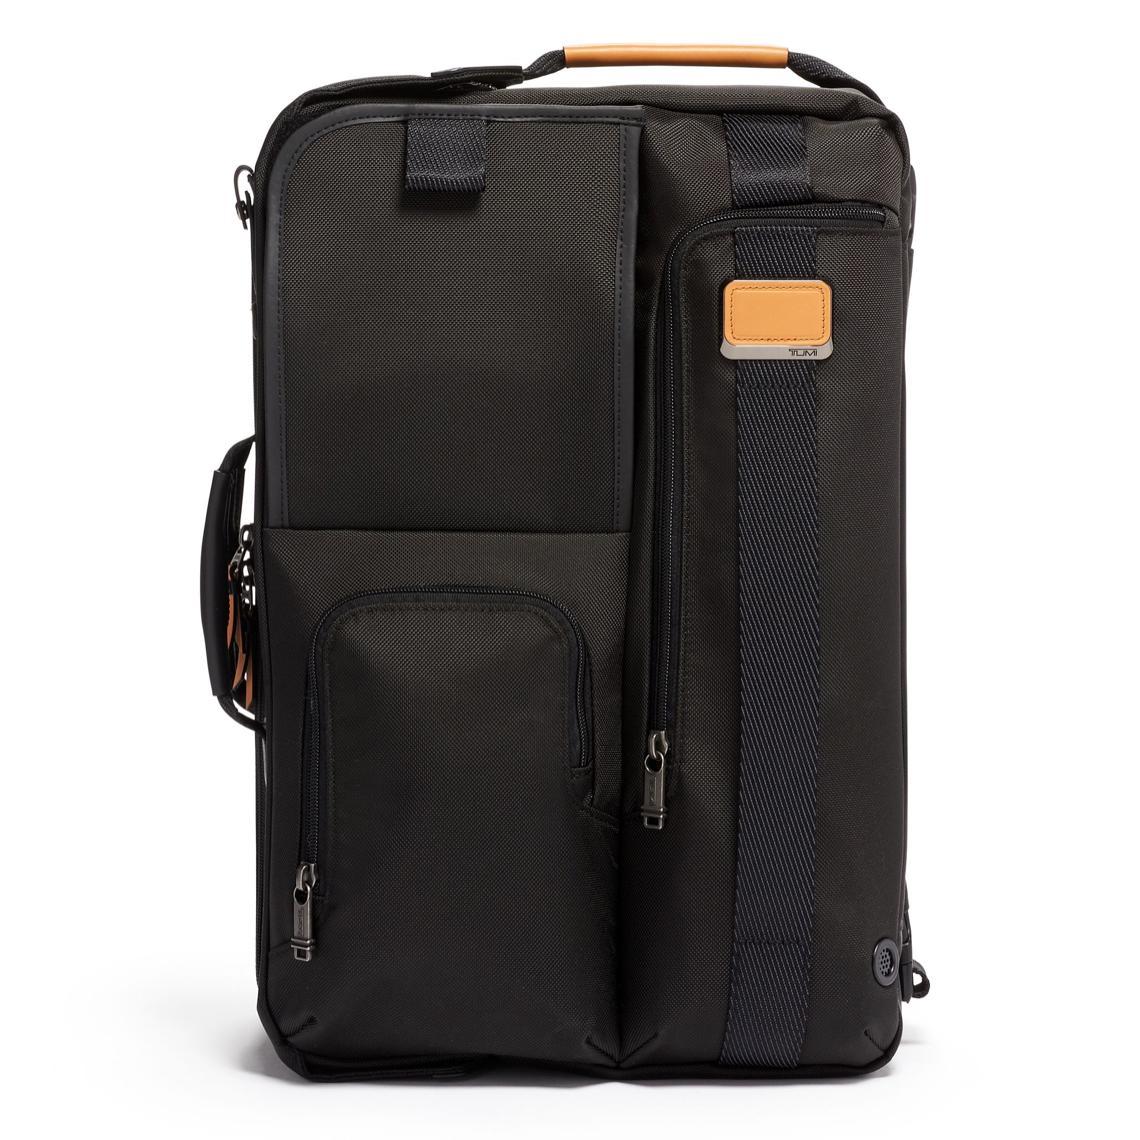 Mark Healey Survival Bag